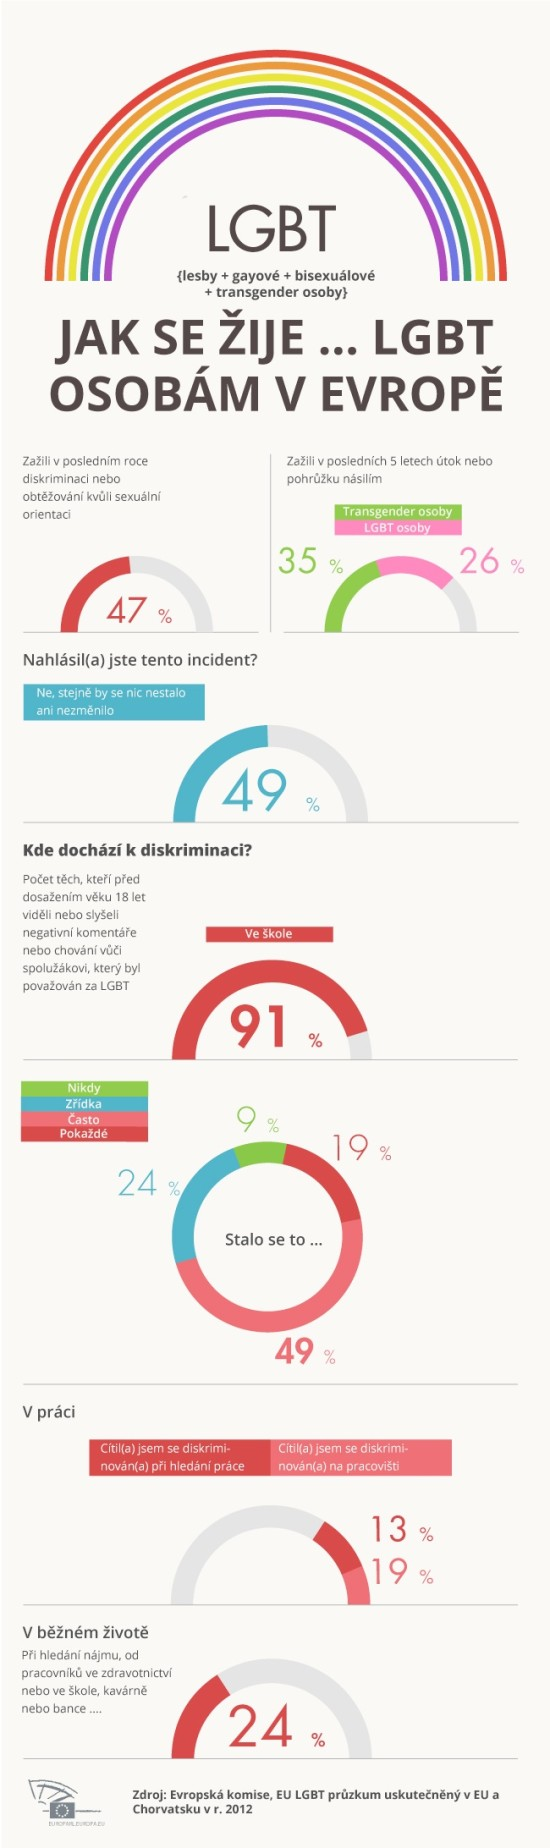 Jak se zije LGBT osobam v Evrope - infografika